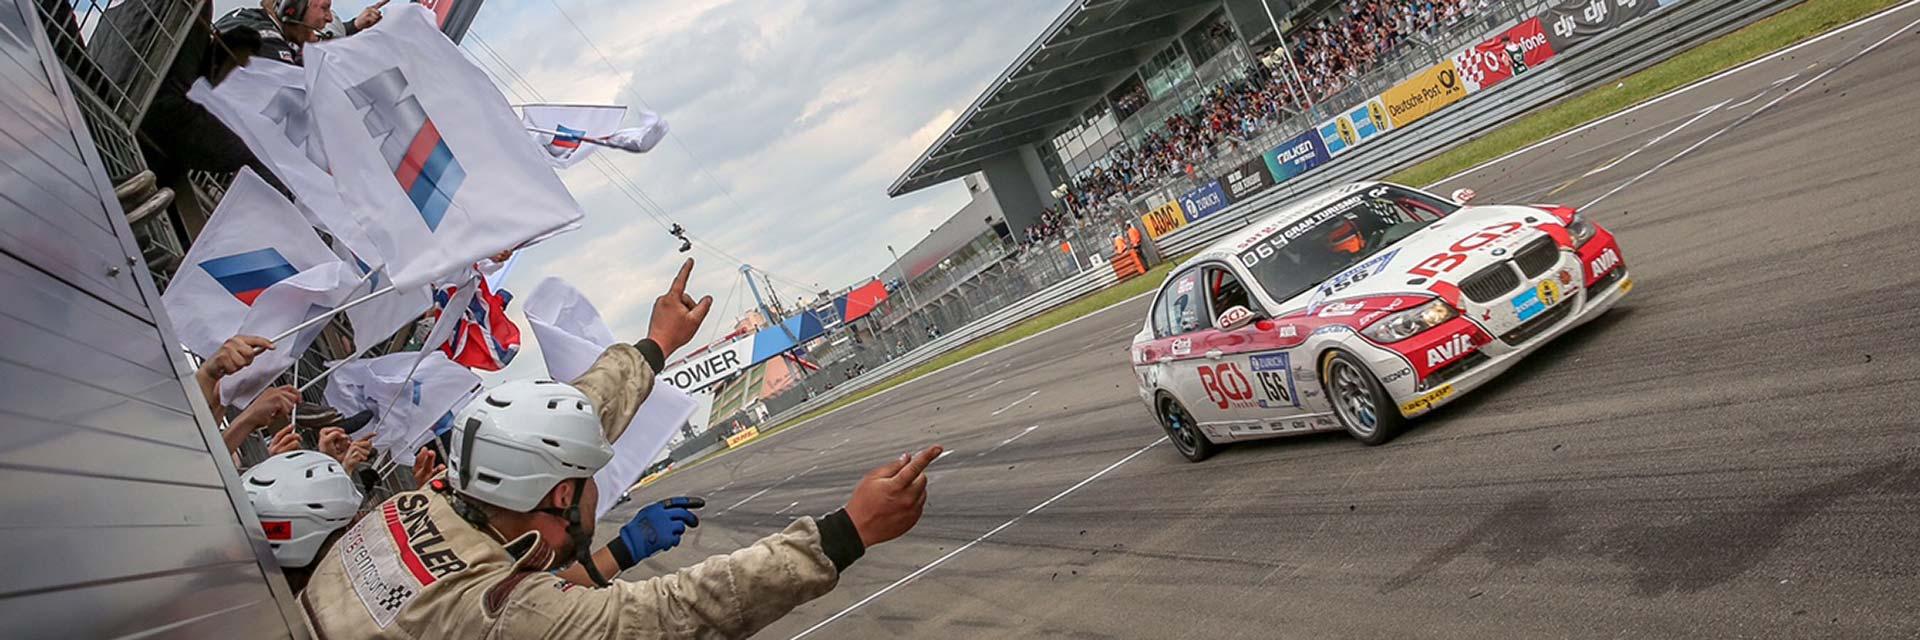 GEDLICH Racing Partner - Sorg Rennsport